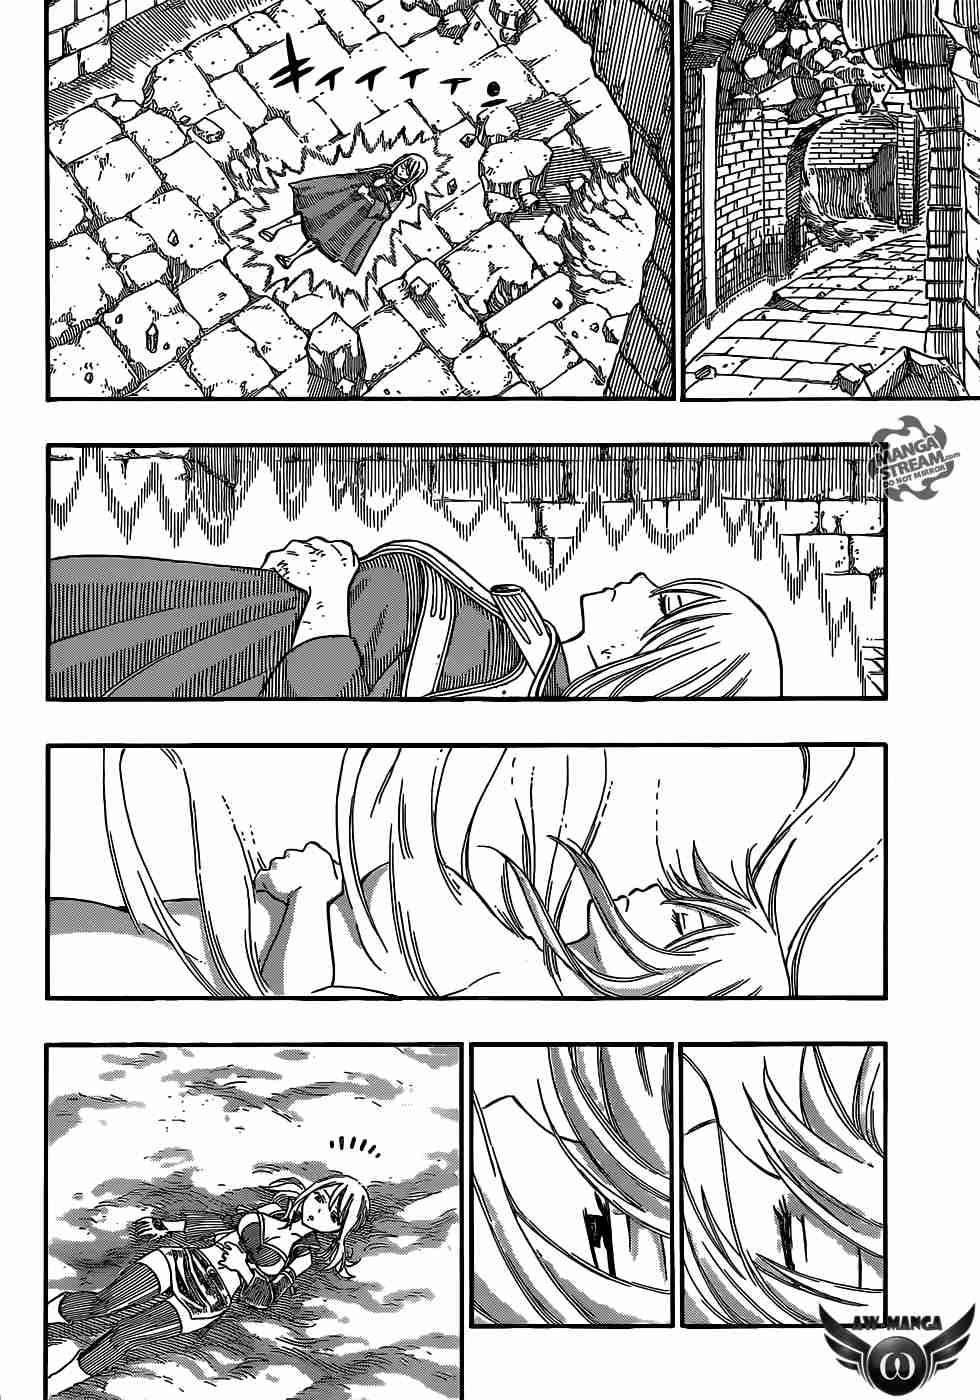 Komik fairy tail 337 - rencana emas 338 Indonesia fairy tail 337 - rencana emas Terbaru 17|Baca Manga Komik Indonesia|Mangacan